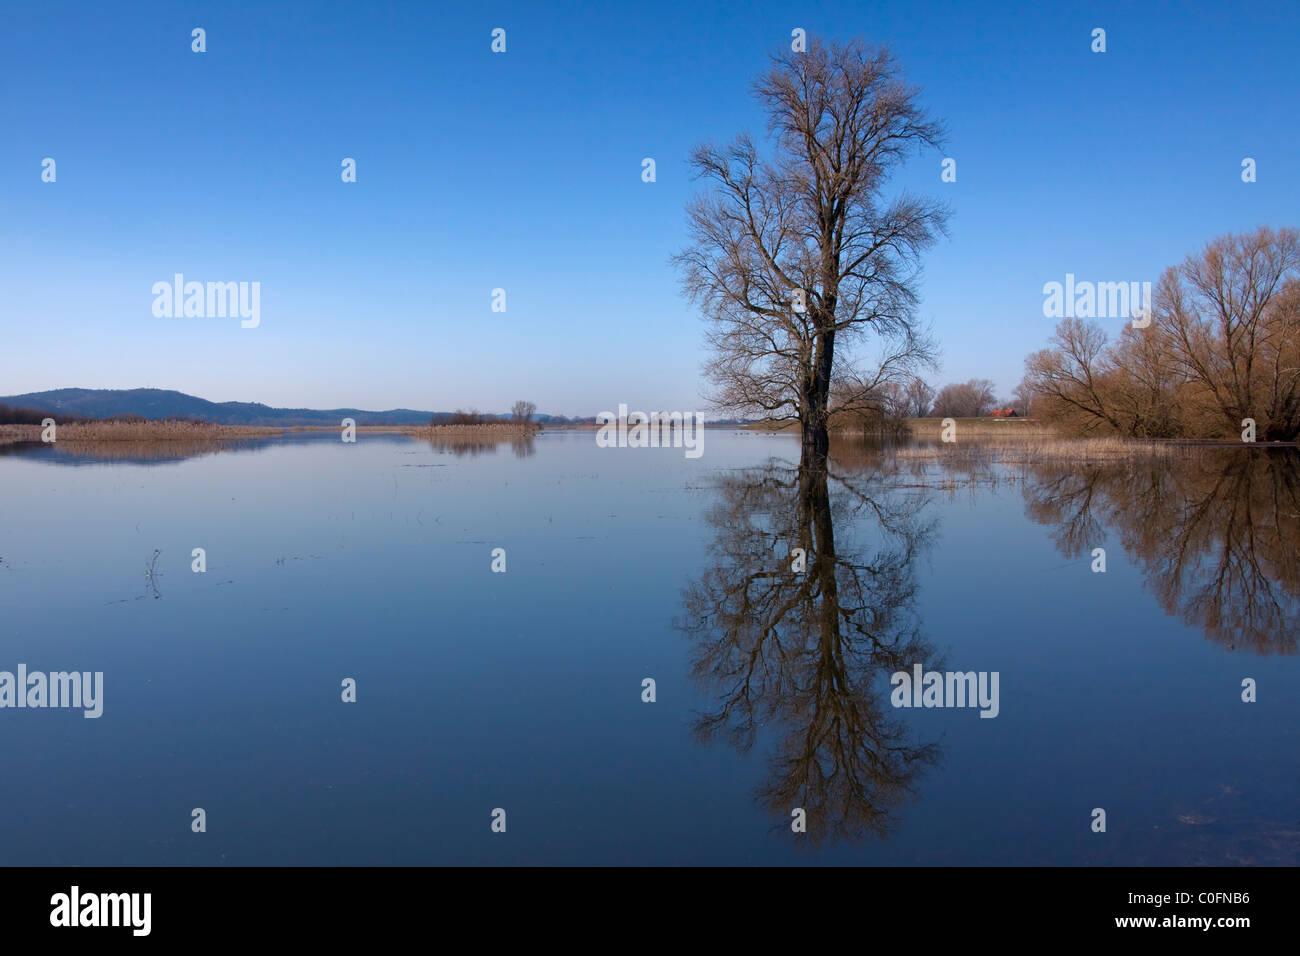 Überschwemmten Wiesen an der Elbe Fluss Landschaft Biosphären-Reservat, Niedersachsen, Germany Stockbild